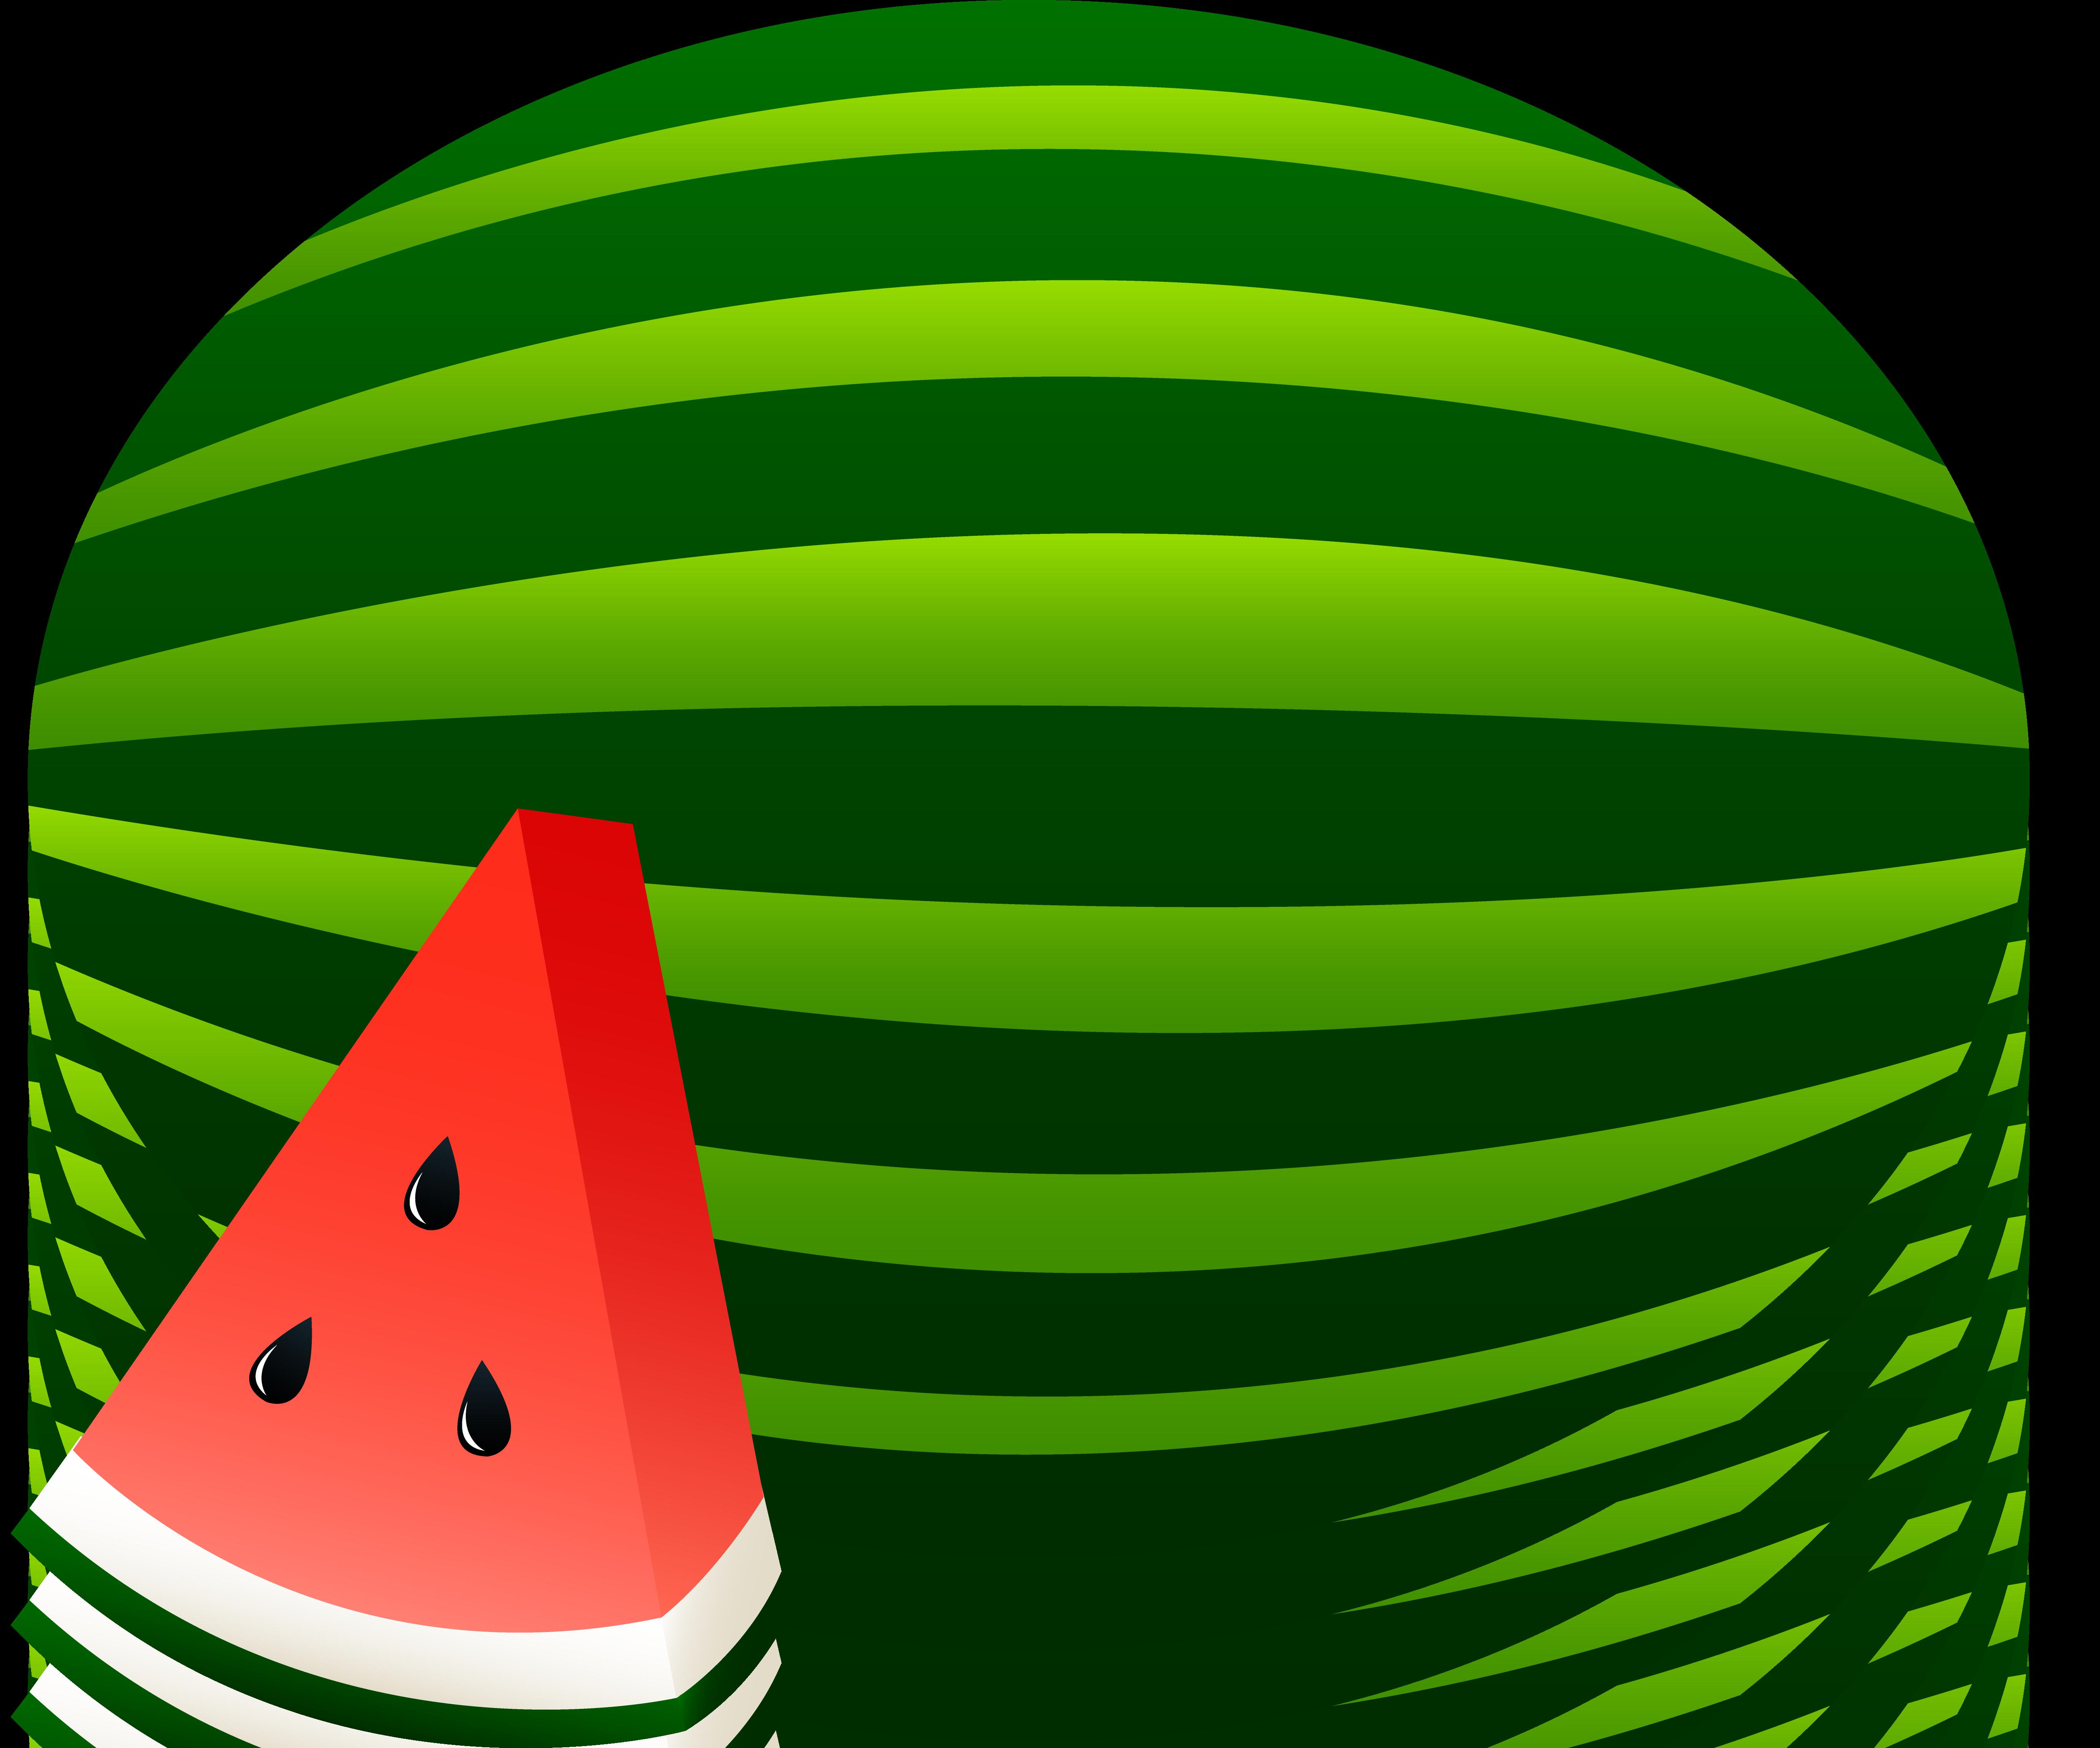 Watermelon 20clipart Clipart Panda Free Clipart Images